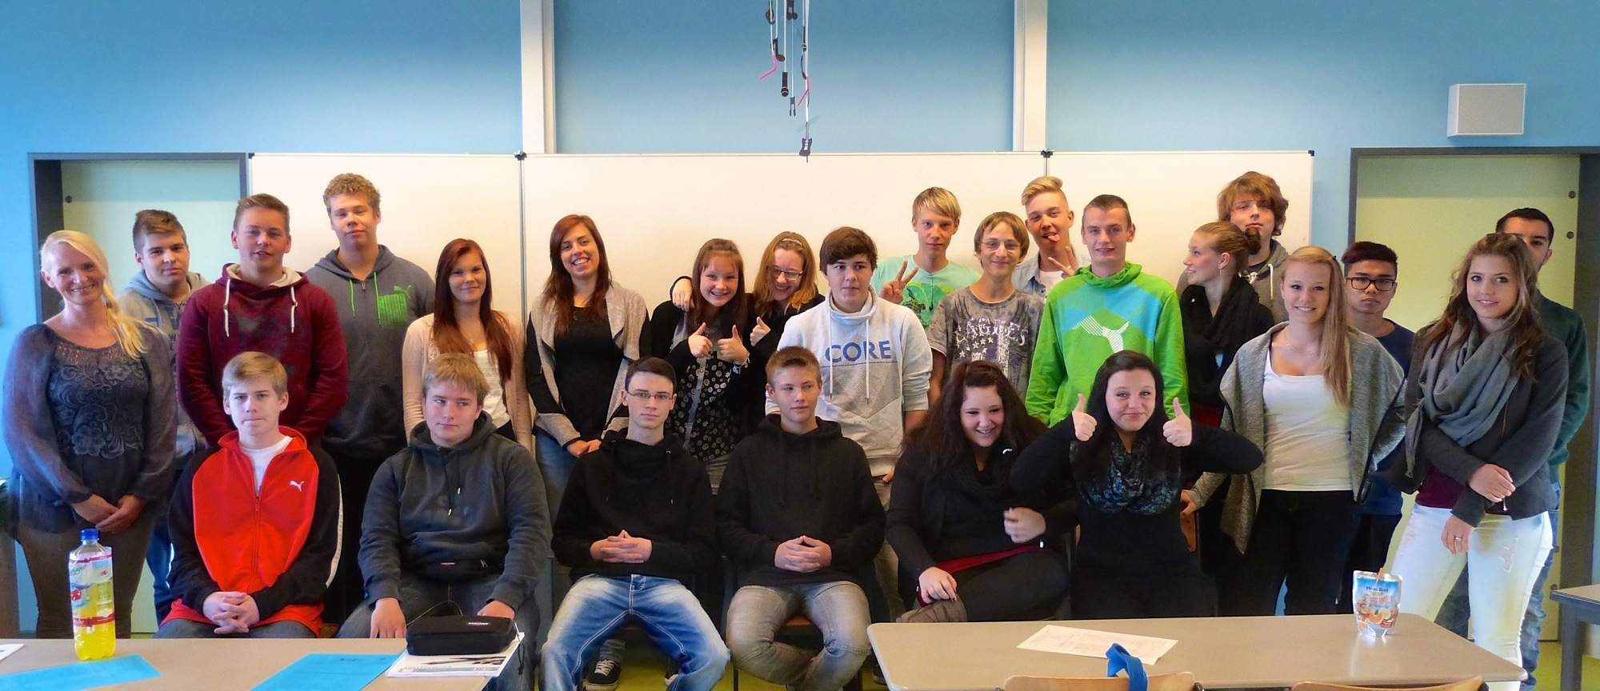 klasse-10a-2014ulk